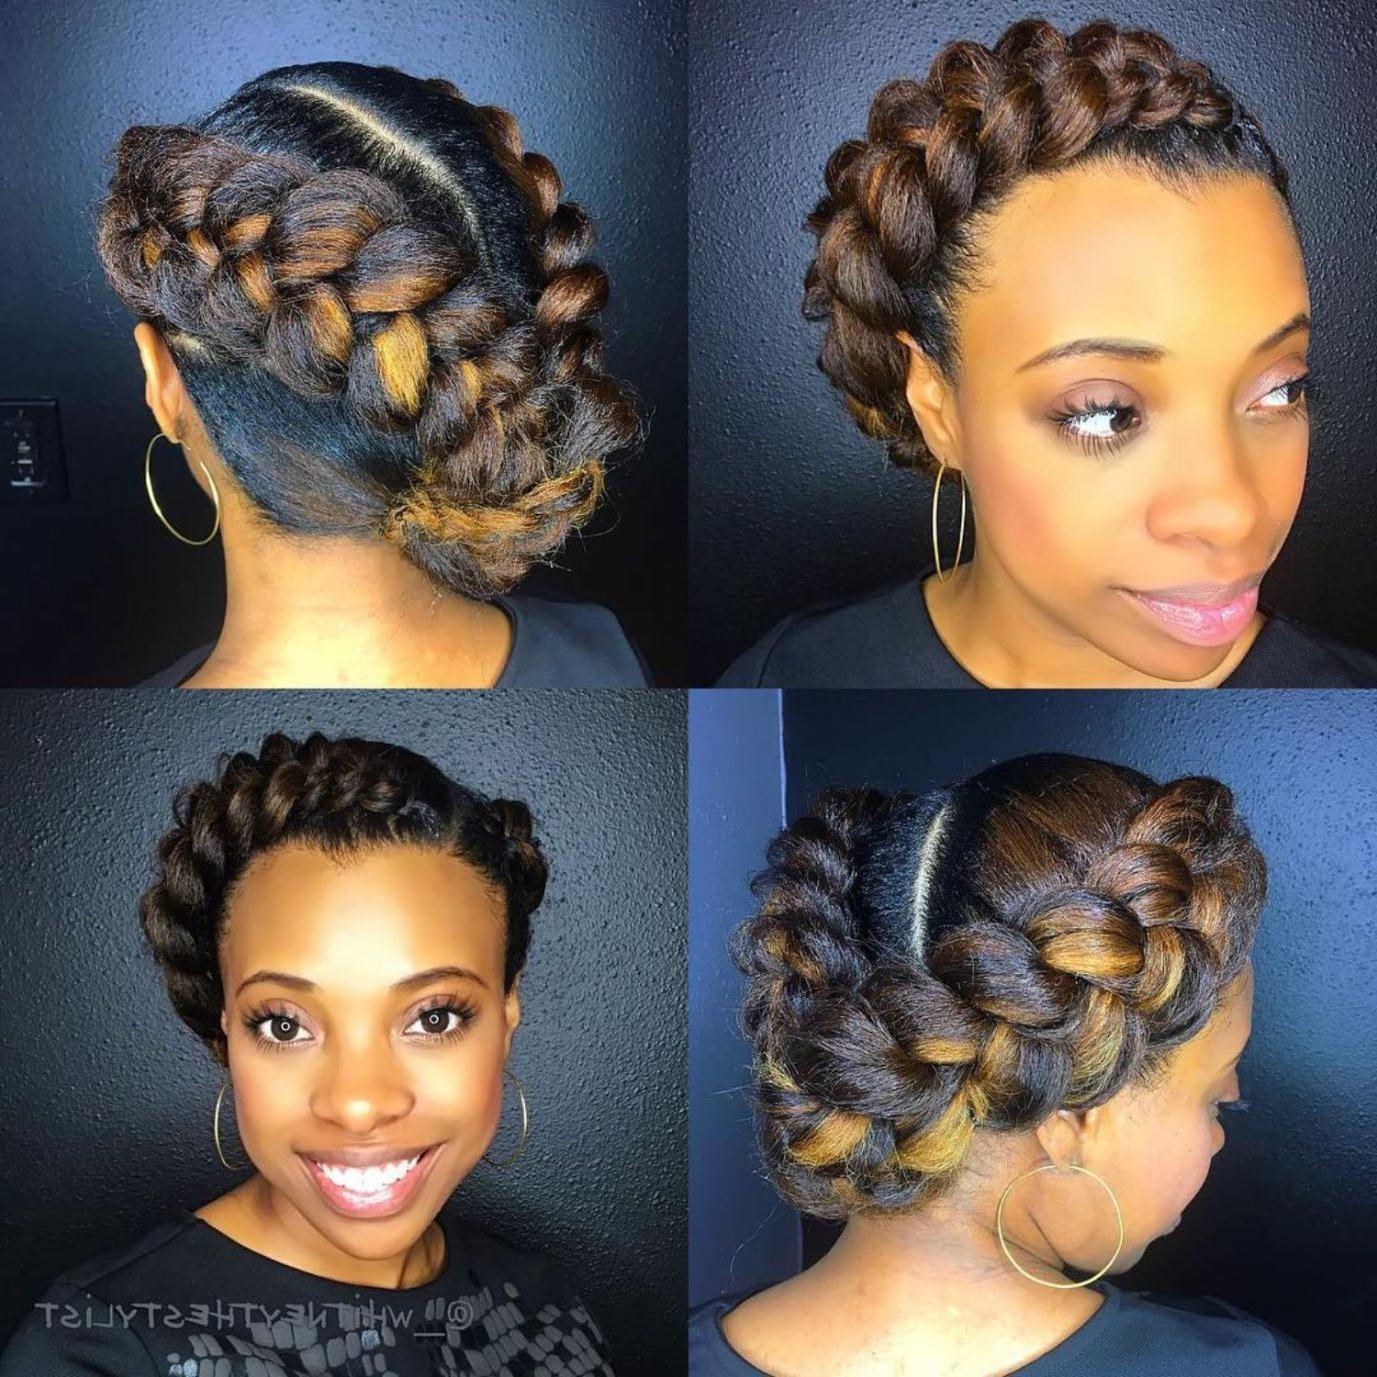 2020 Natural Protective Bun Micro Braid Hairstyles In 60 Easy And Showy Protective Hairstyles For Natural Hair (View 2 of 20)